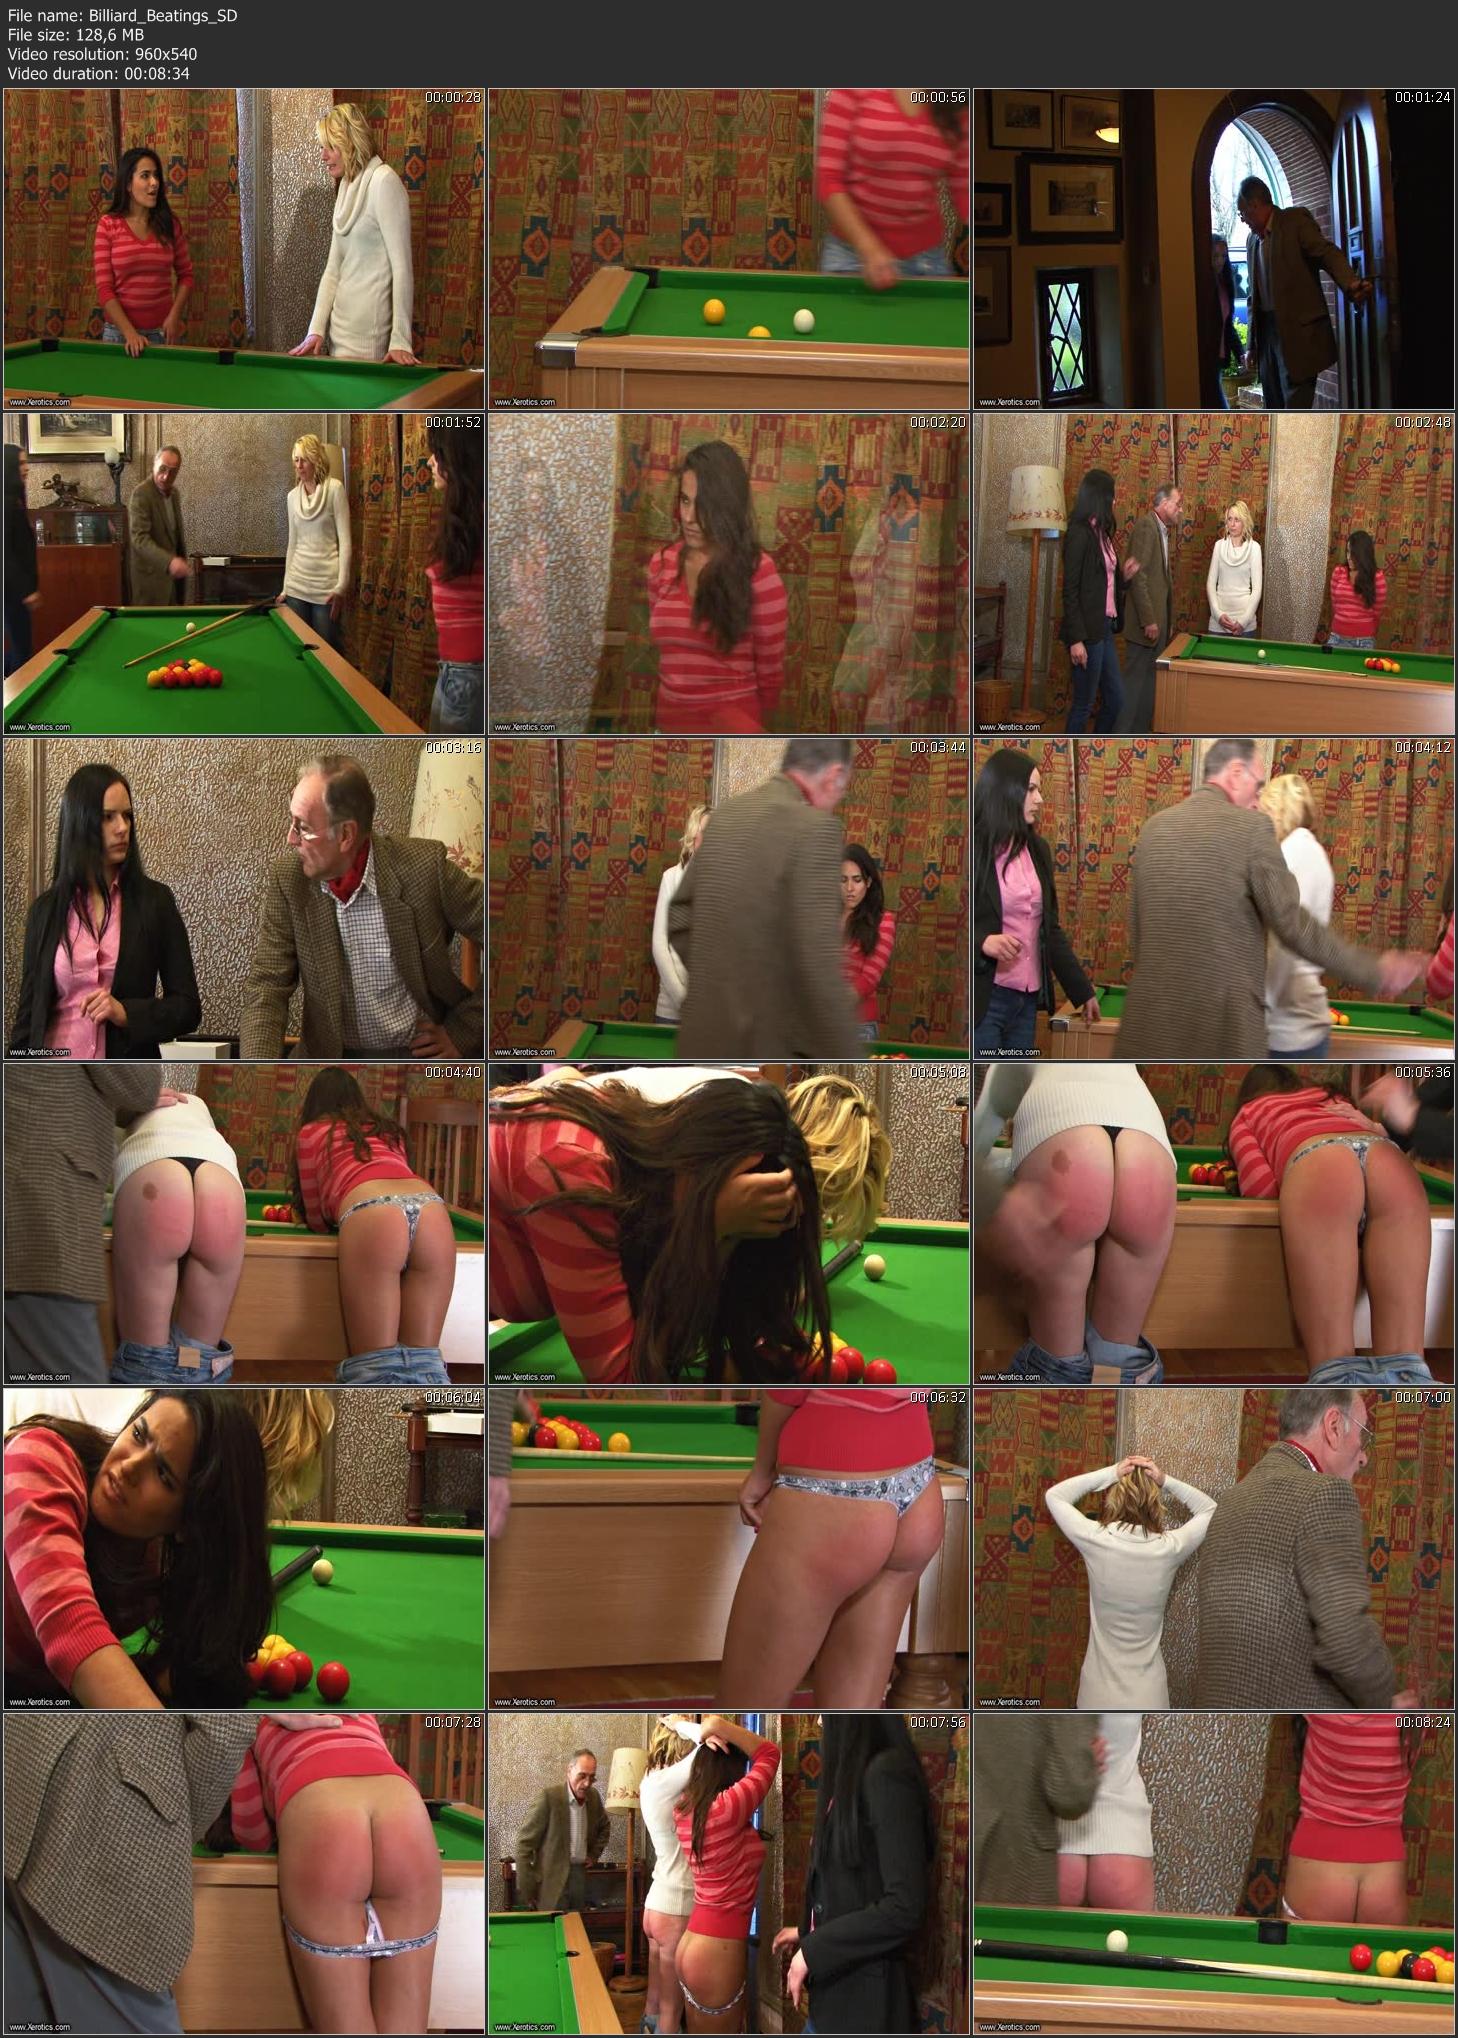 billiard_beatings_sd (image 2),